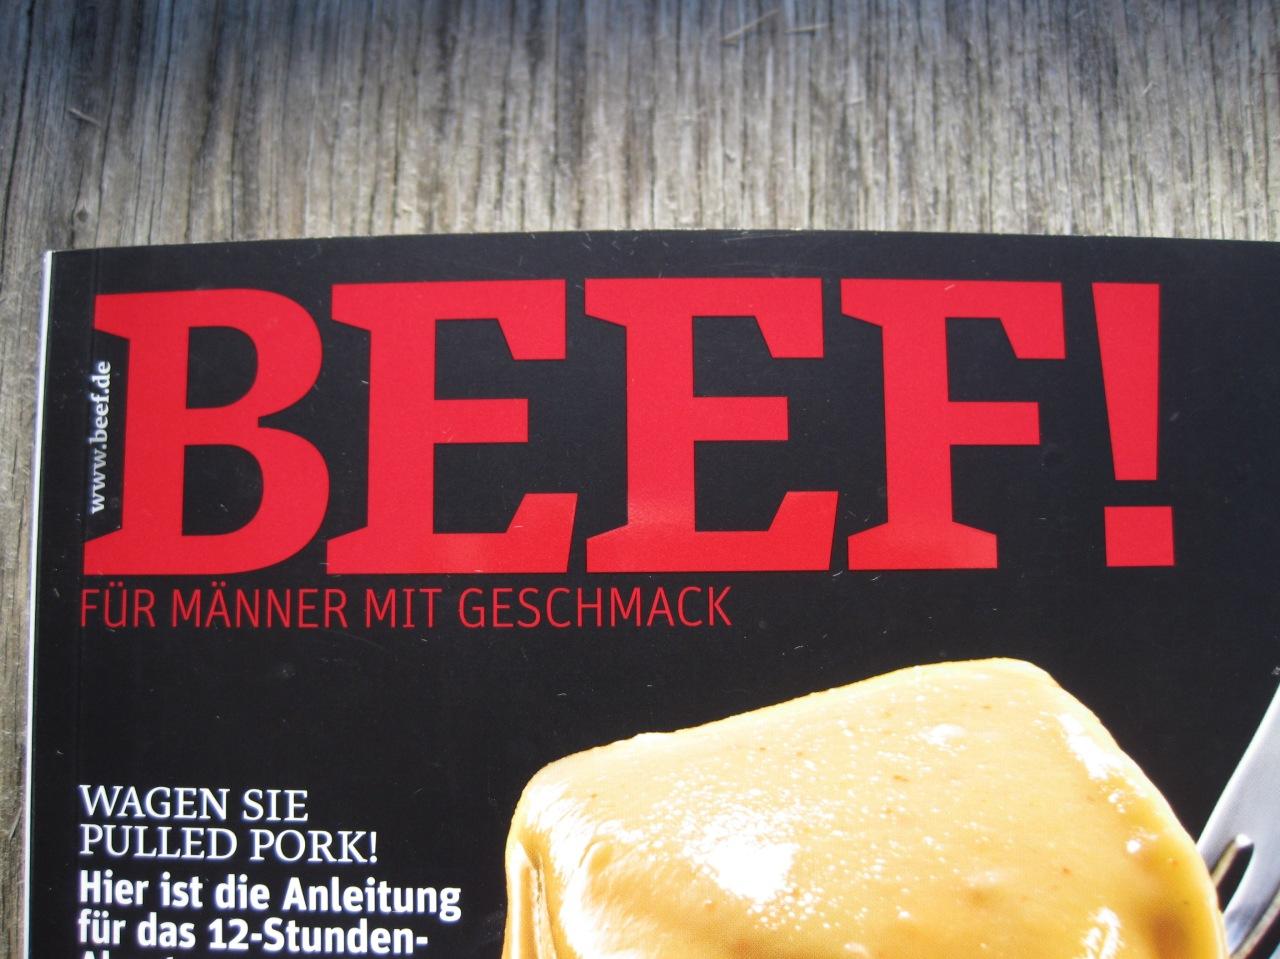 BEEF! – Kochen fürMänner